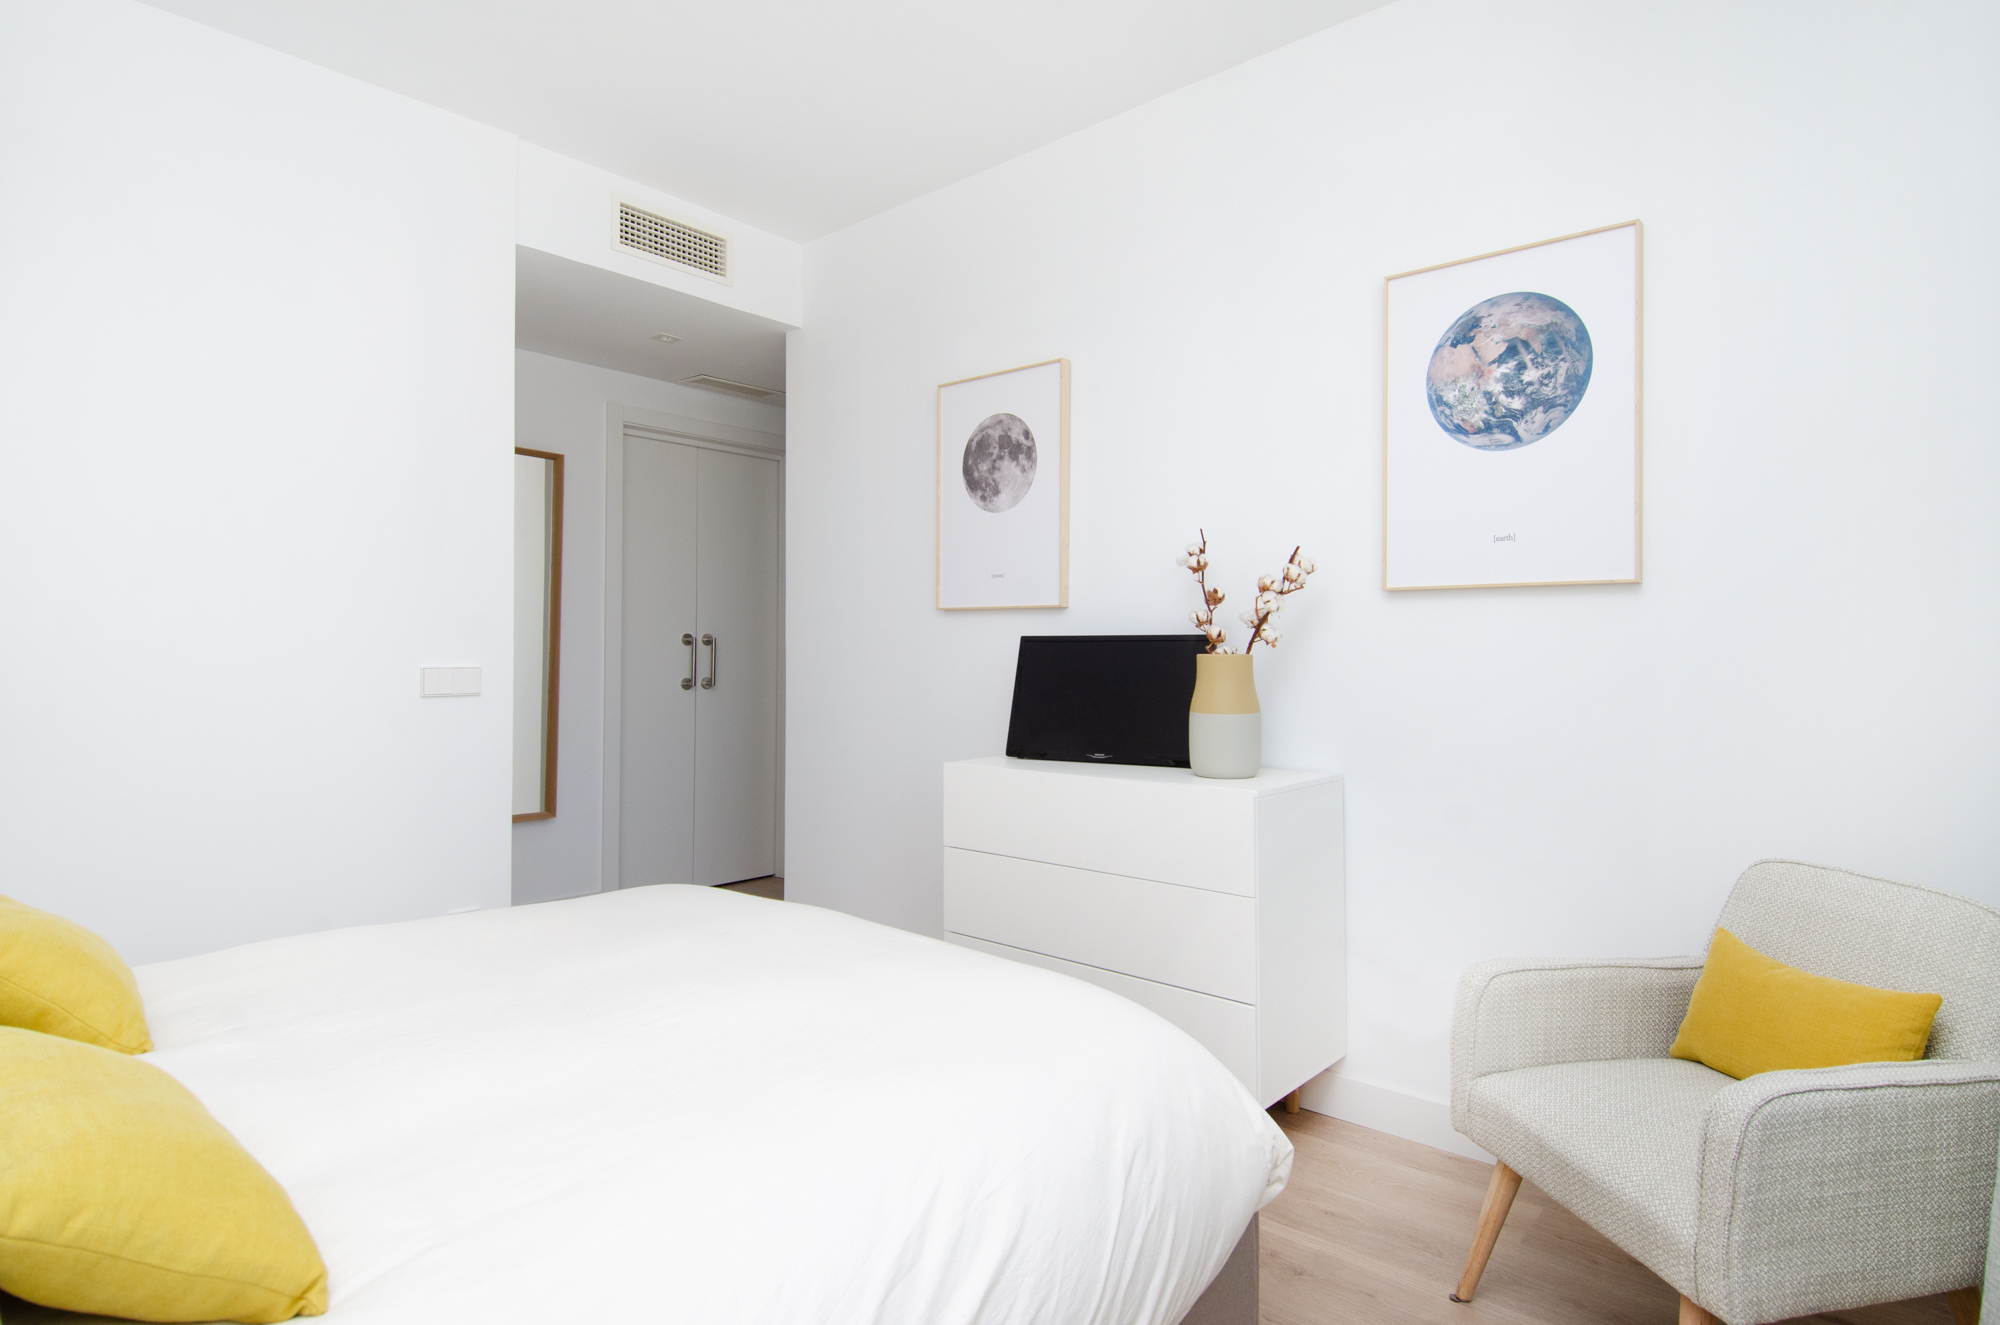 interiorismo-decoracion-ana-de-cabo-reforma-piso-santa-eugenia (30)